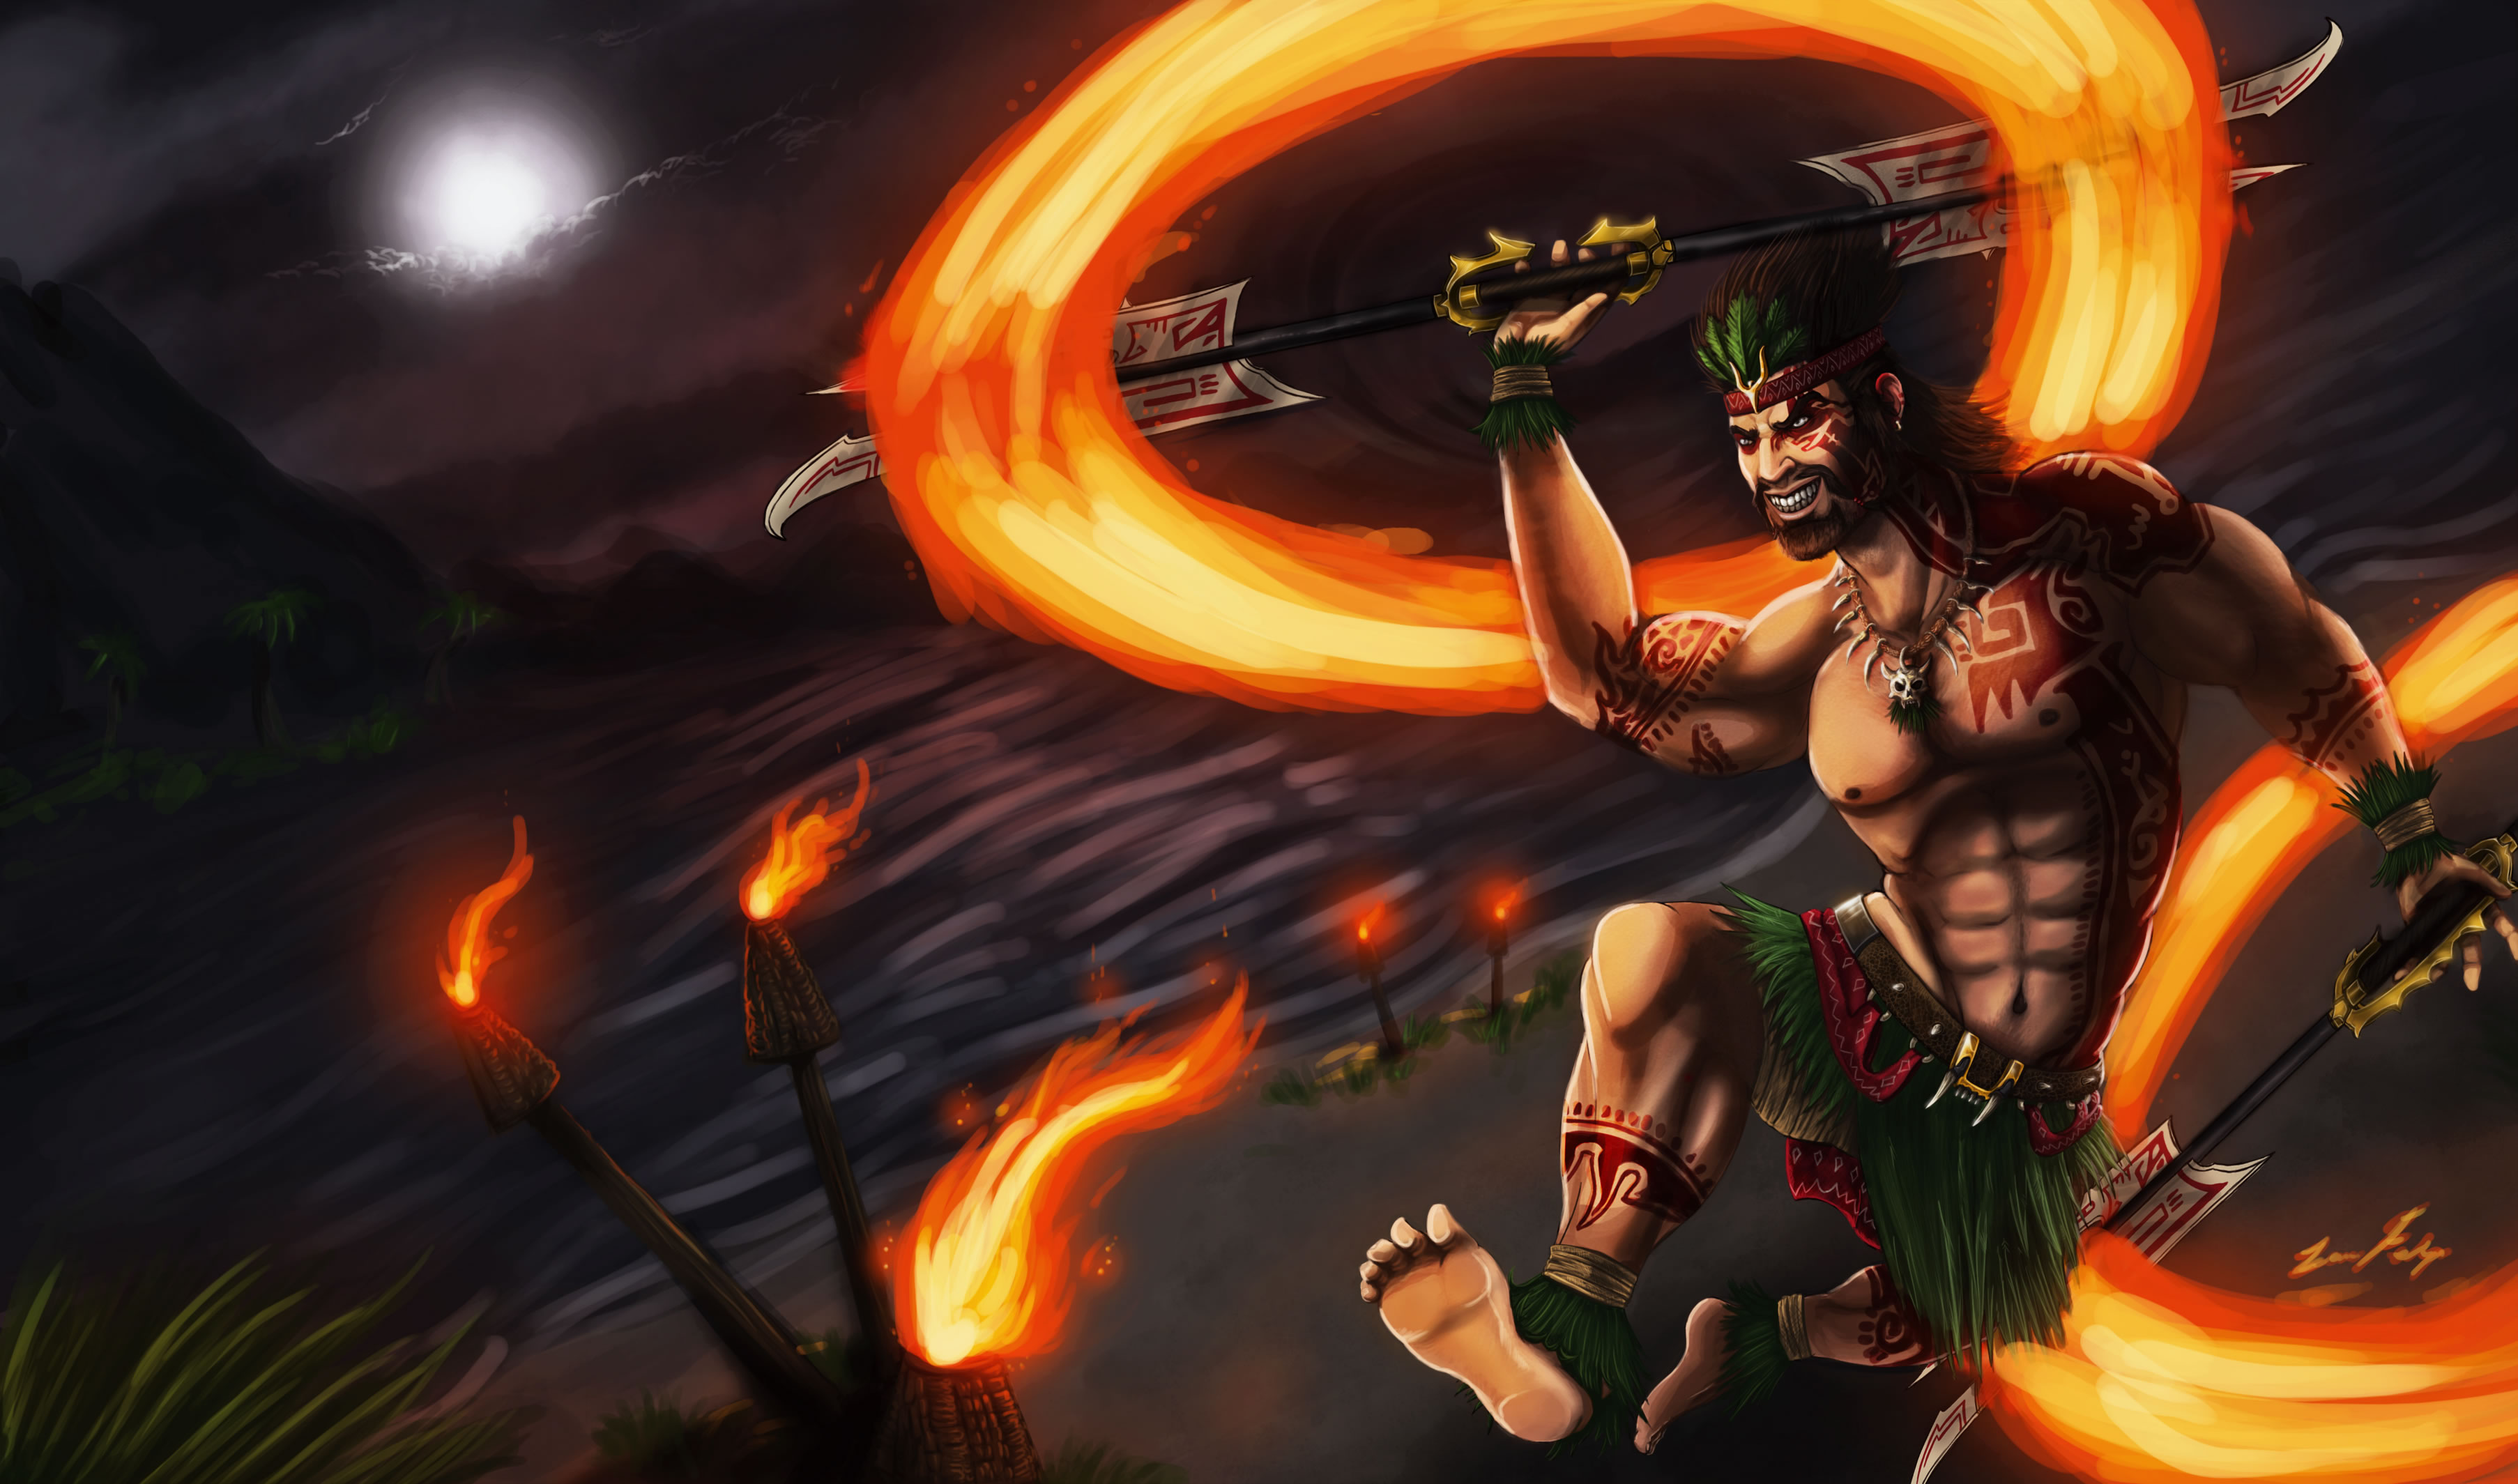 Firedancer Draven by Dargonite (1)